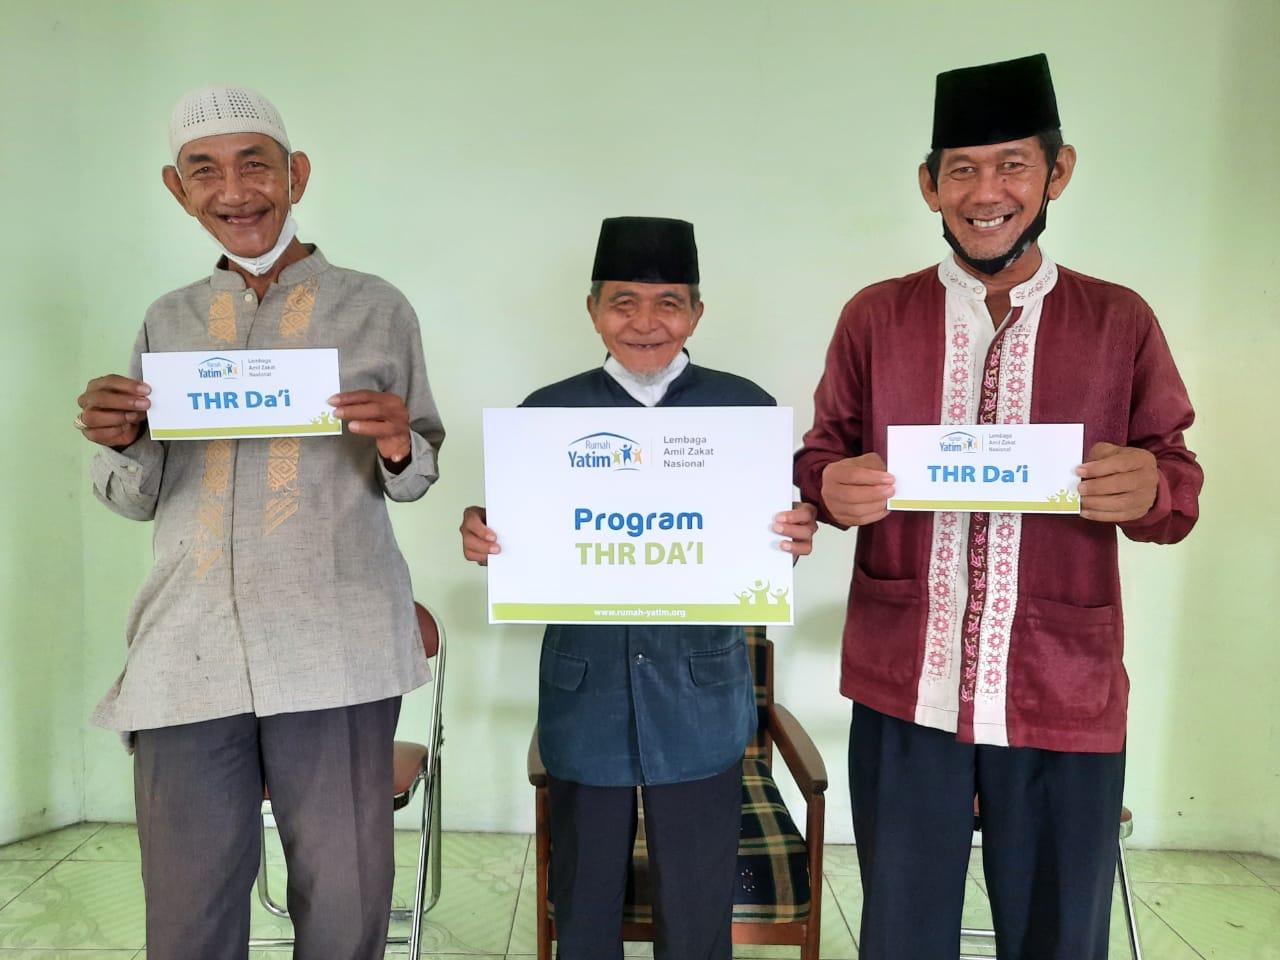 Rumah Yatim Berikan Program Bantuan THR Da'i untuk Para Mubaligh Pekanbaru